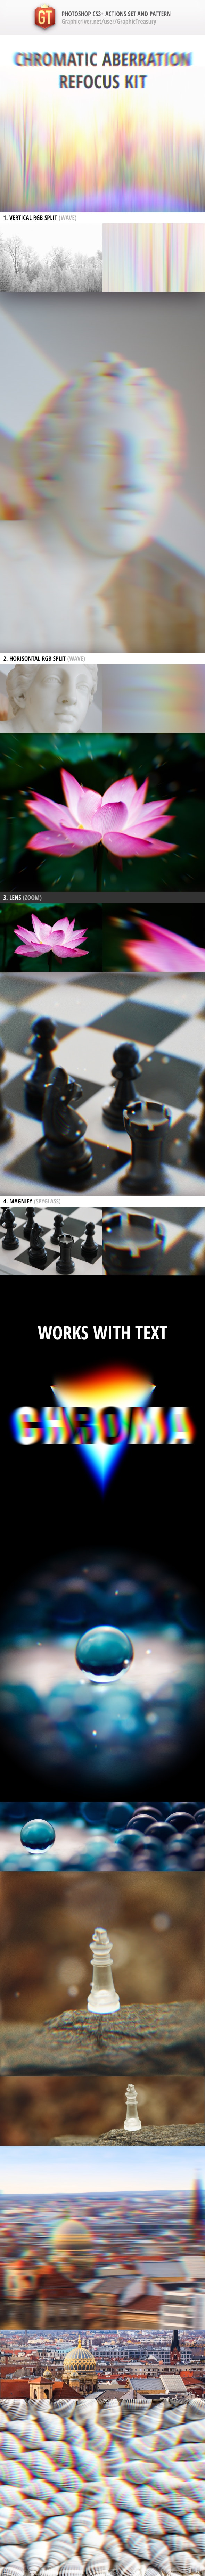 Chromatic Aberration Refocus Kit - Photo Effects Actions